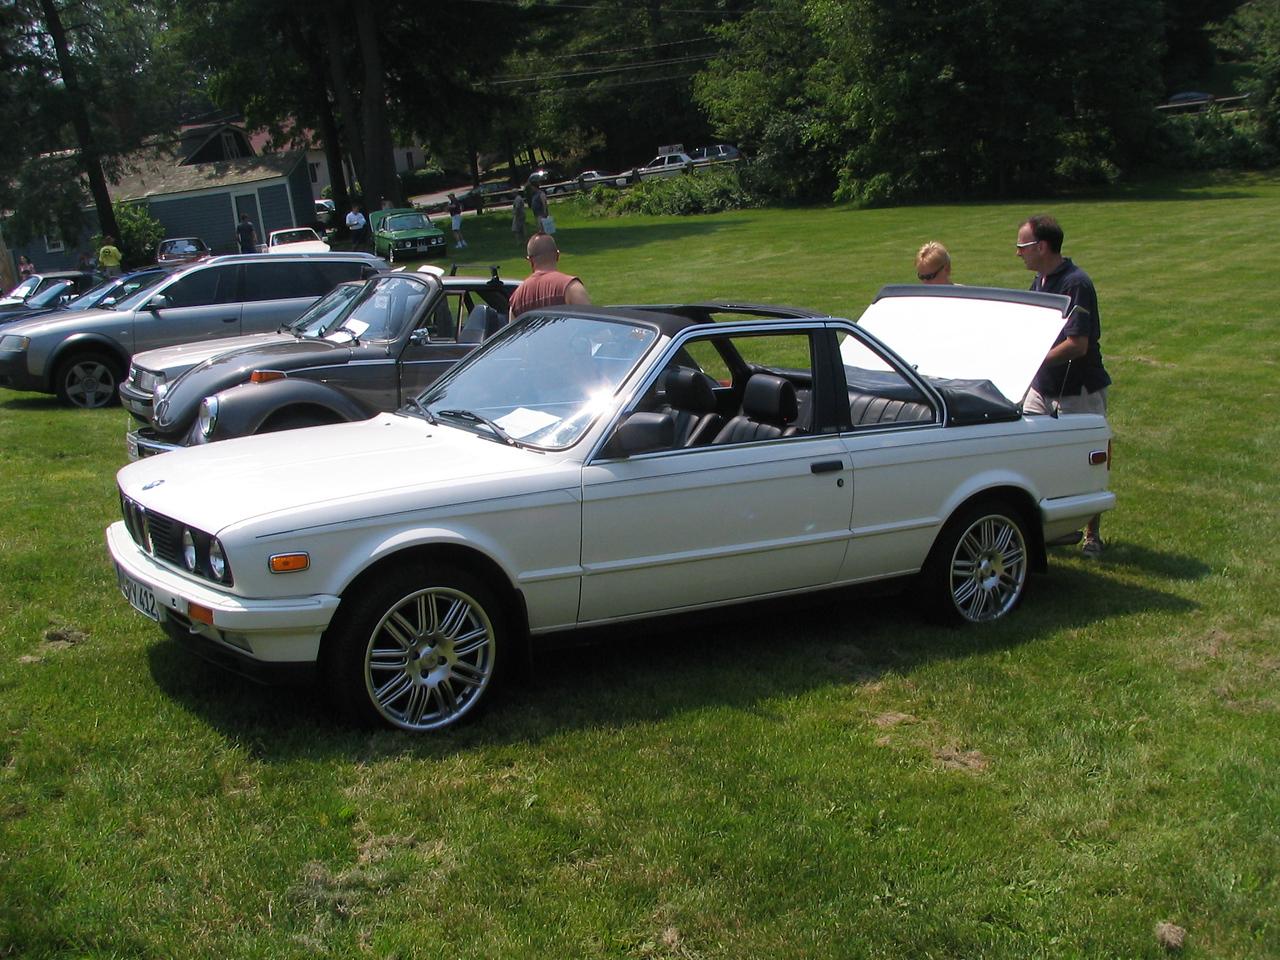 BMW 323 Baur convertible